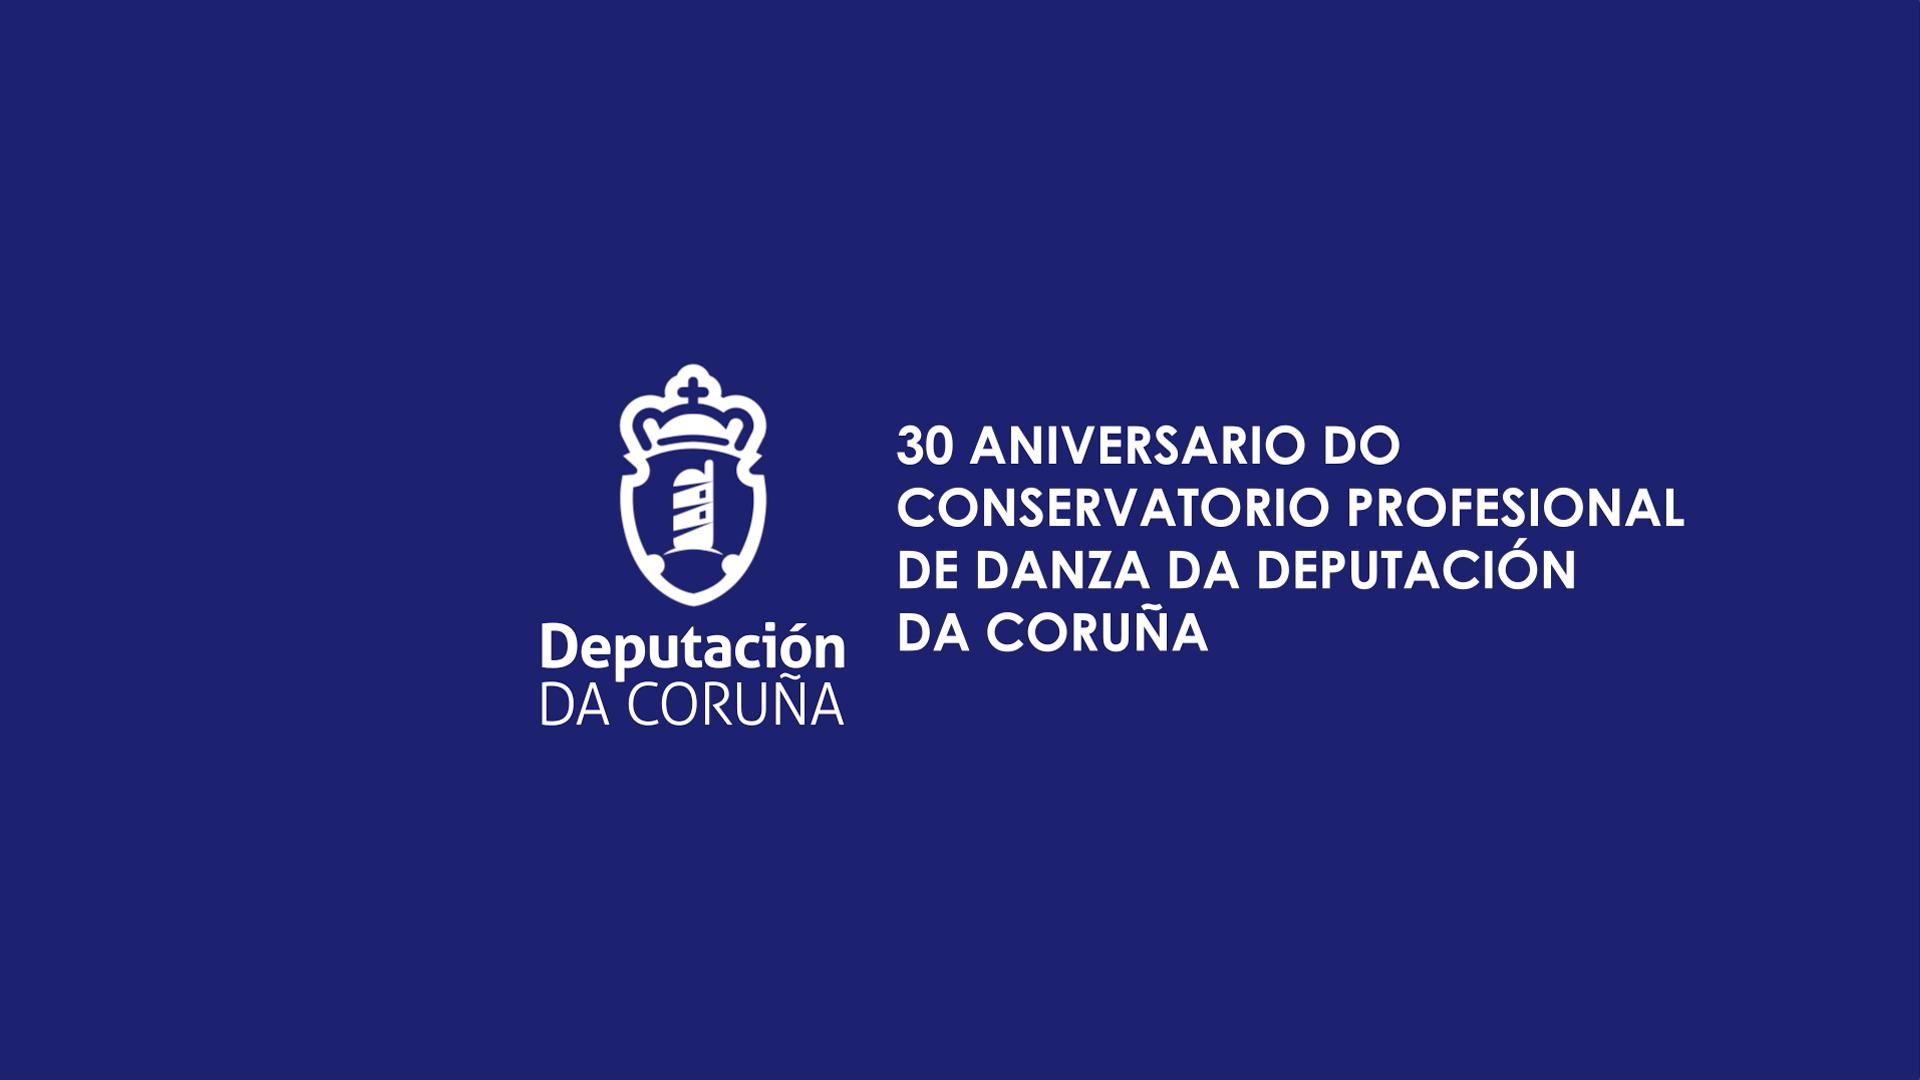 30 Aniversario del Conservatorio Profesional de Danza